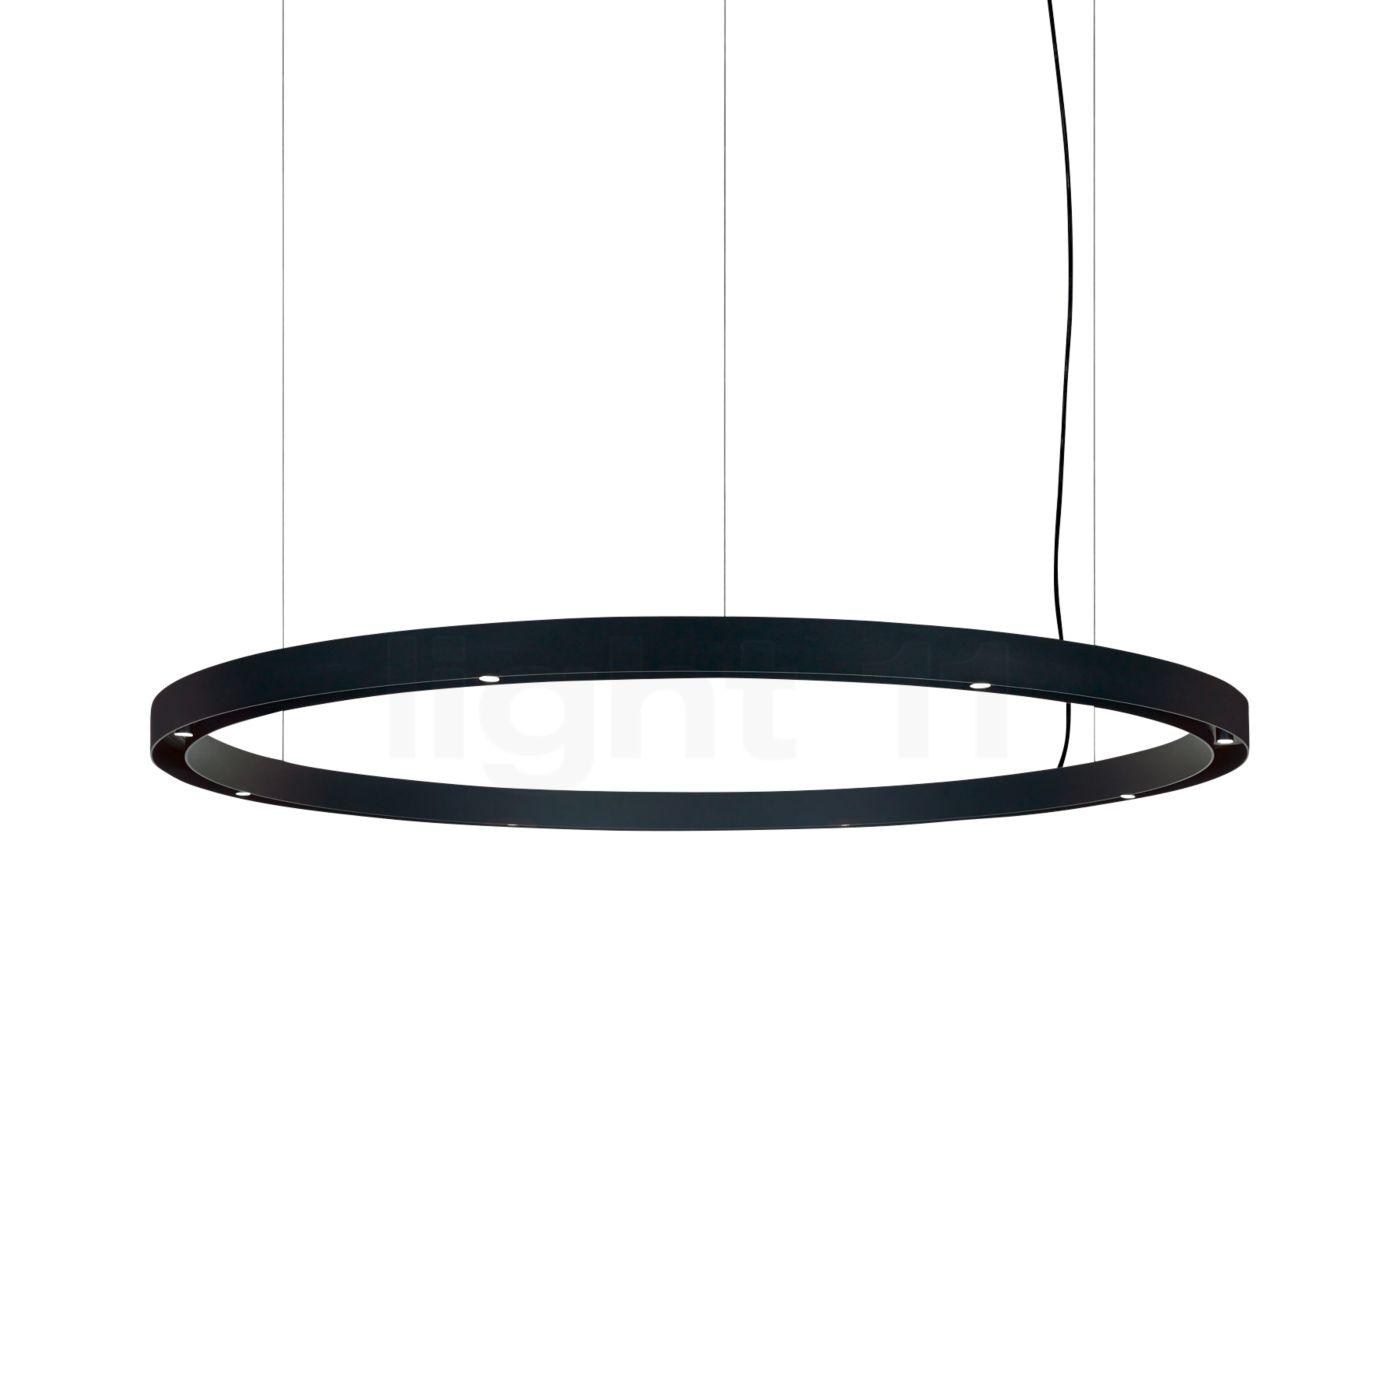 Delta Light Super-Oh! Pendelleuchte LED, ø170 cm 308 17 08 822 B